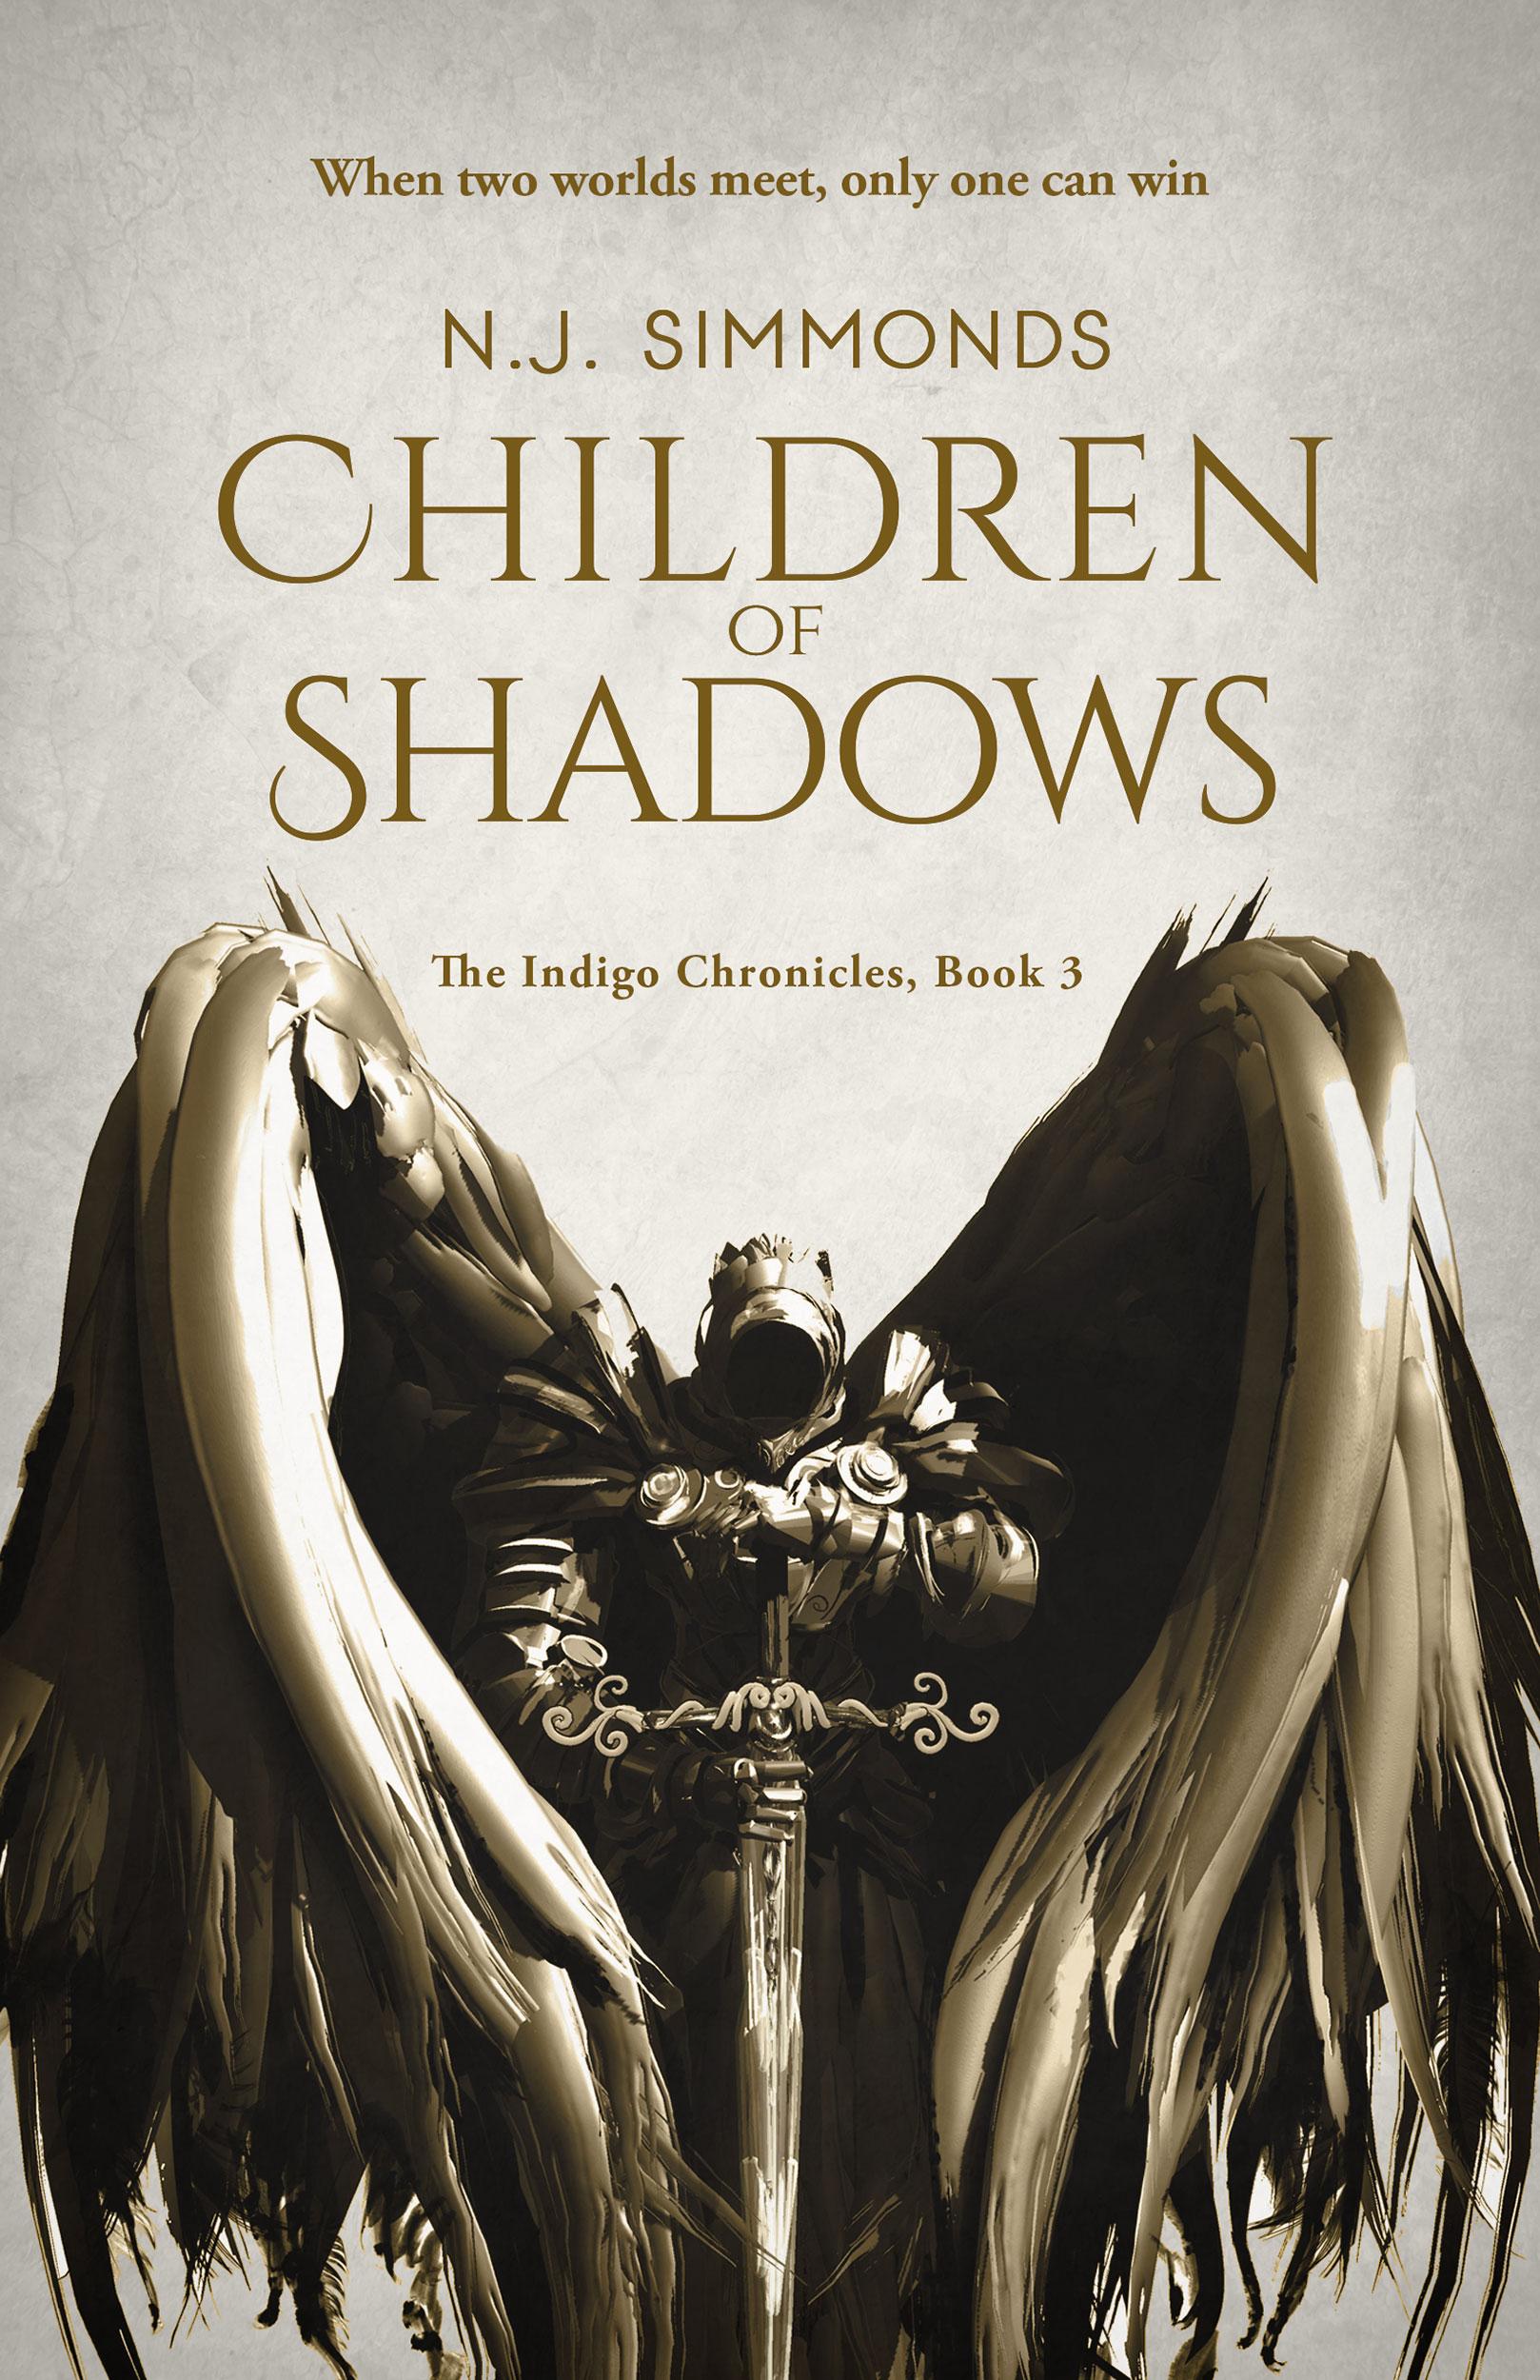 Children of Shadows by N.J. Simmonds